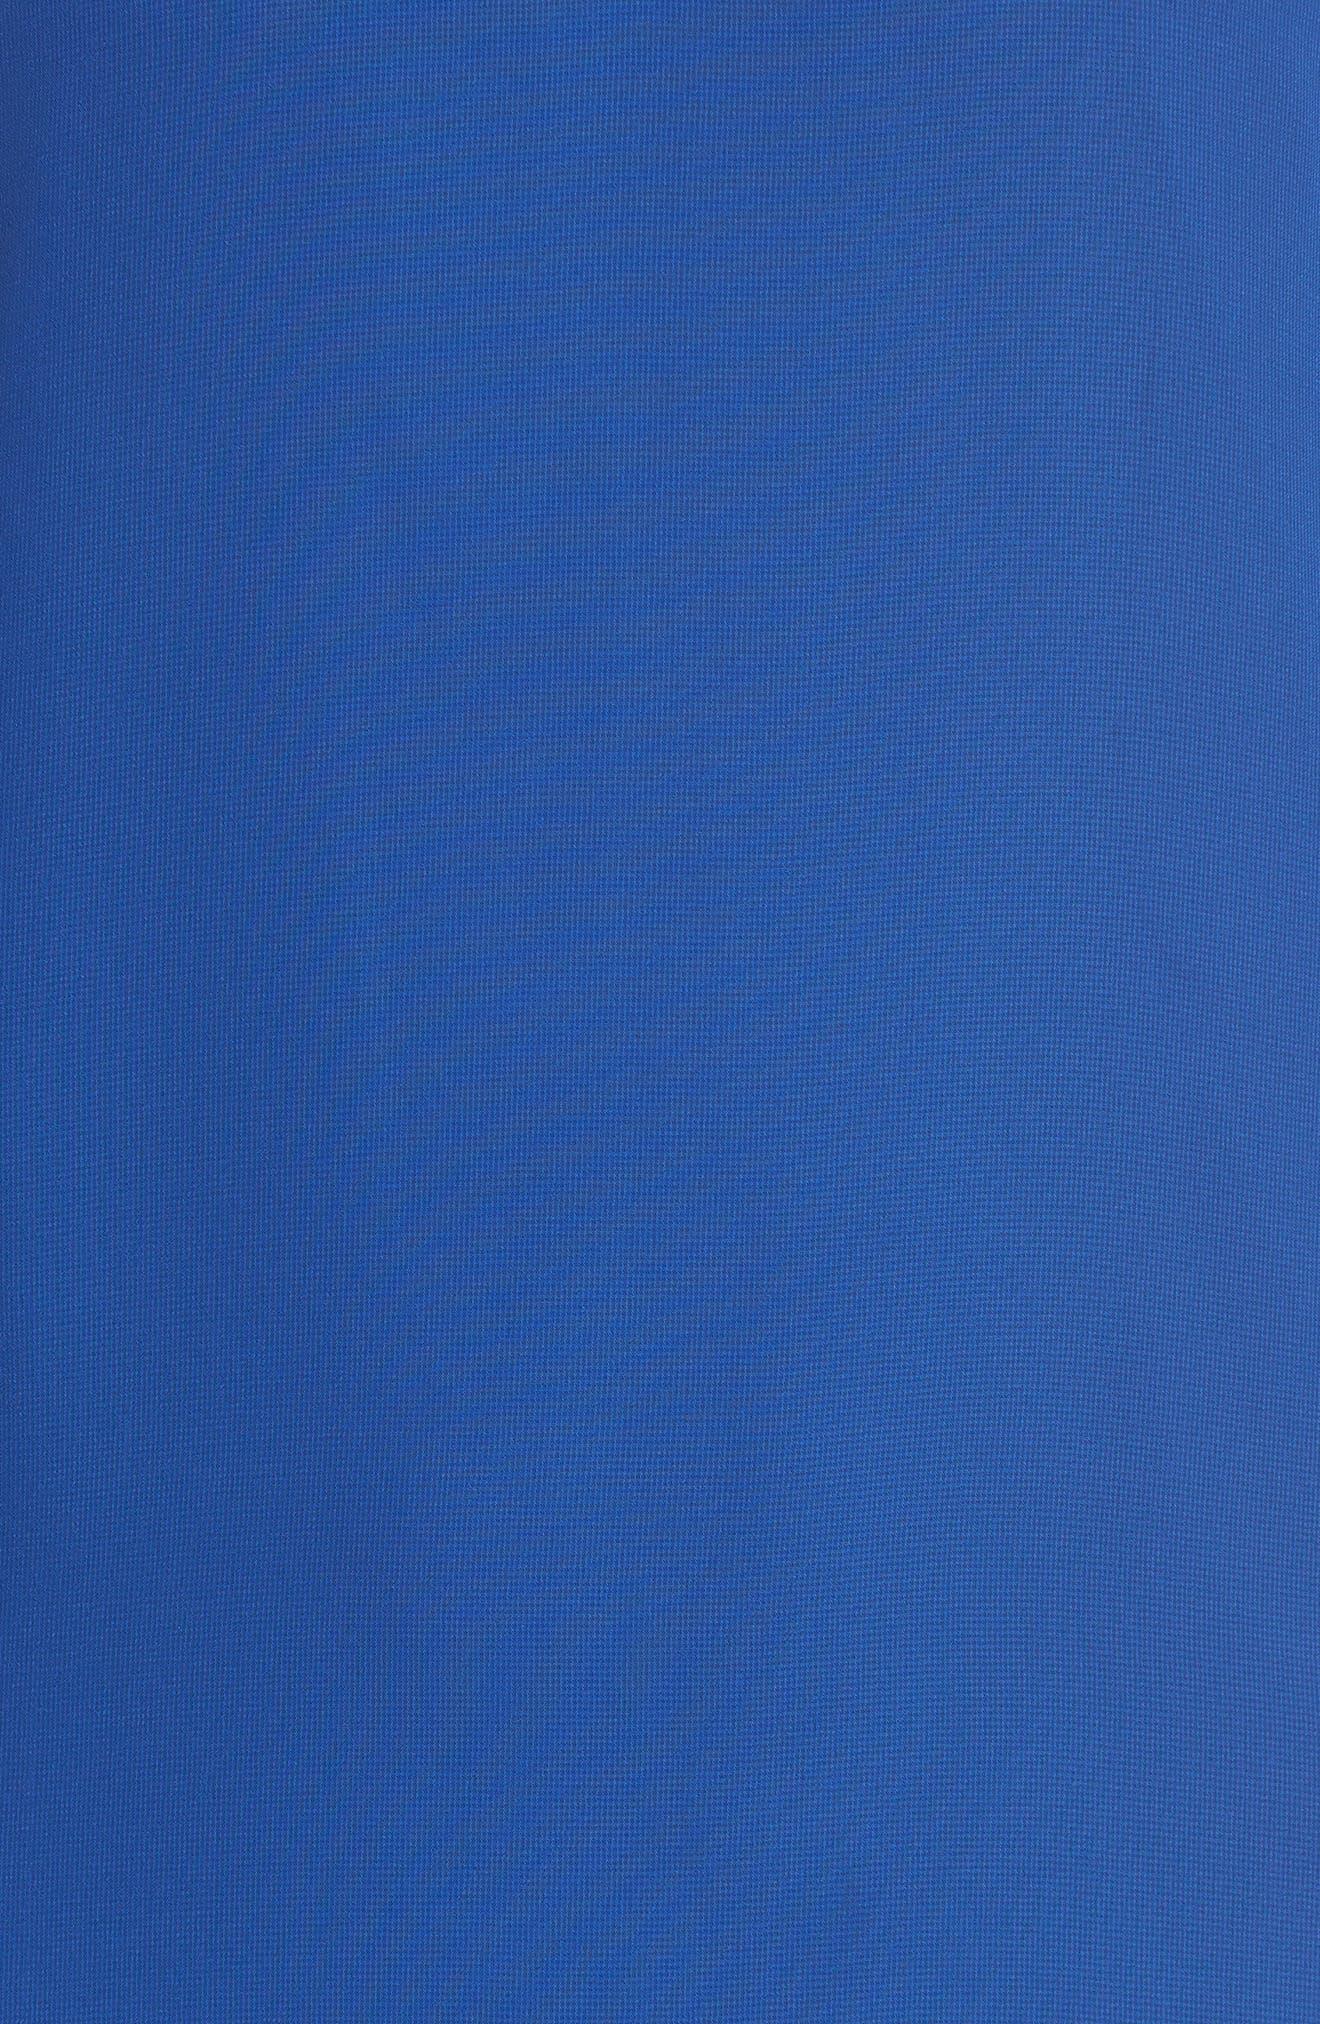 Carmen Tiered Ruffle Sleeve Shift Dress,                             Alternate thumbnail 6, color,                             Deep Sapphire